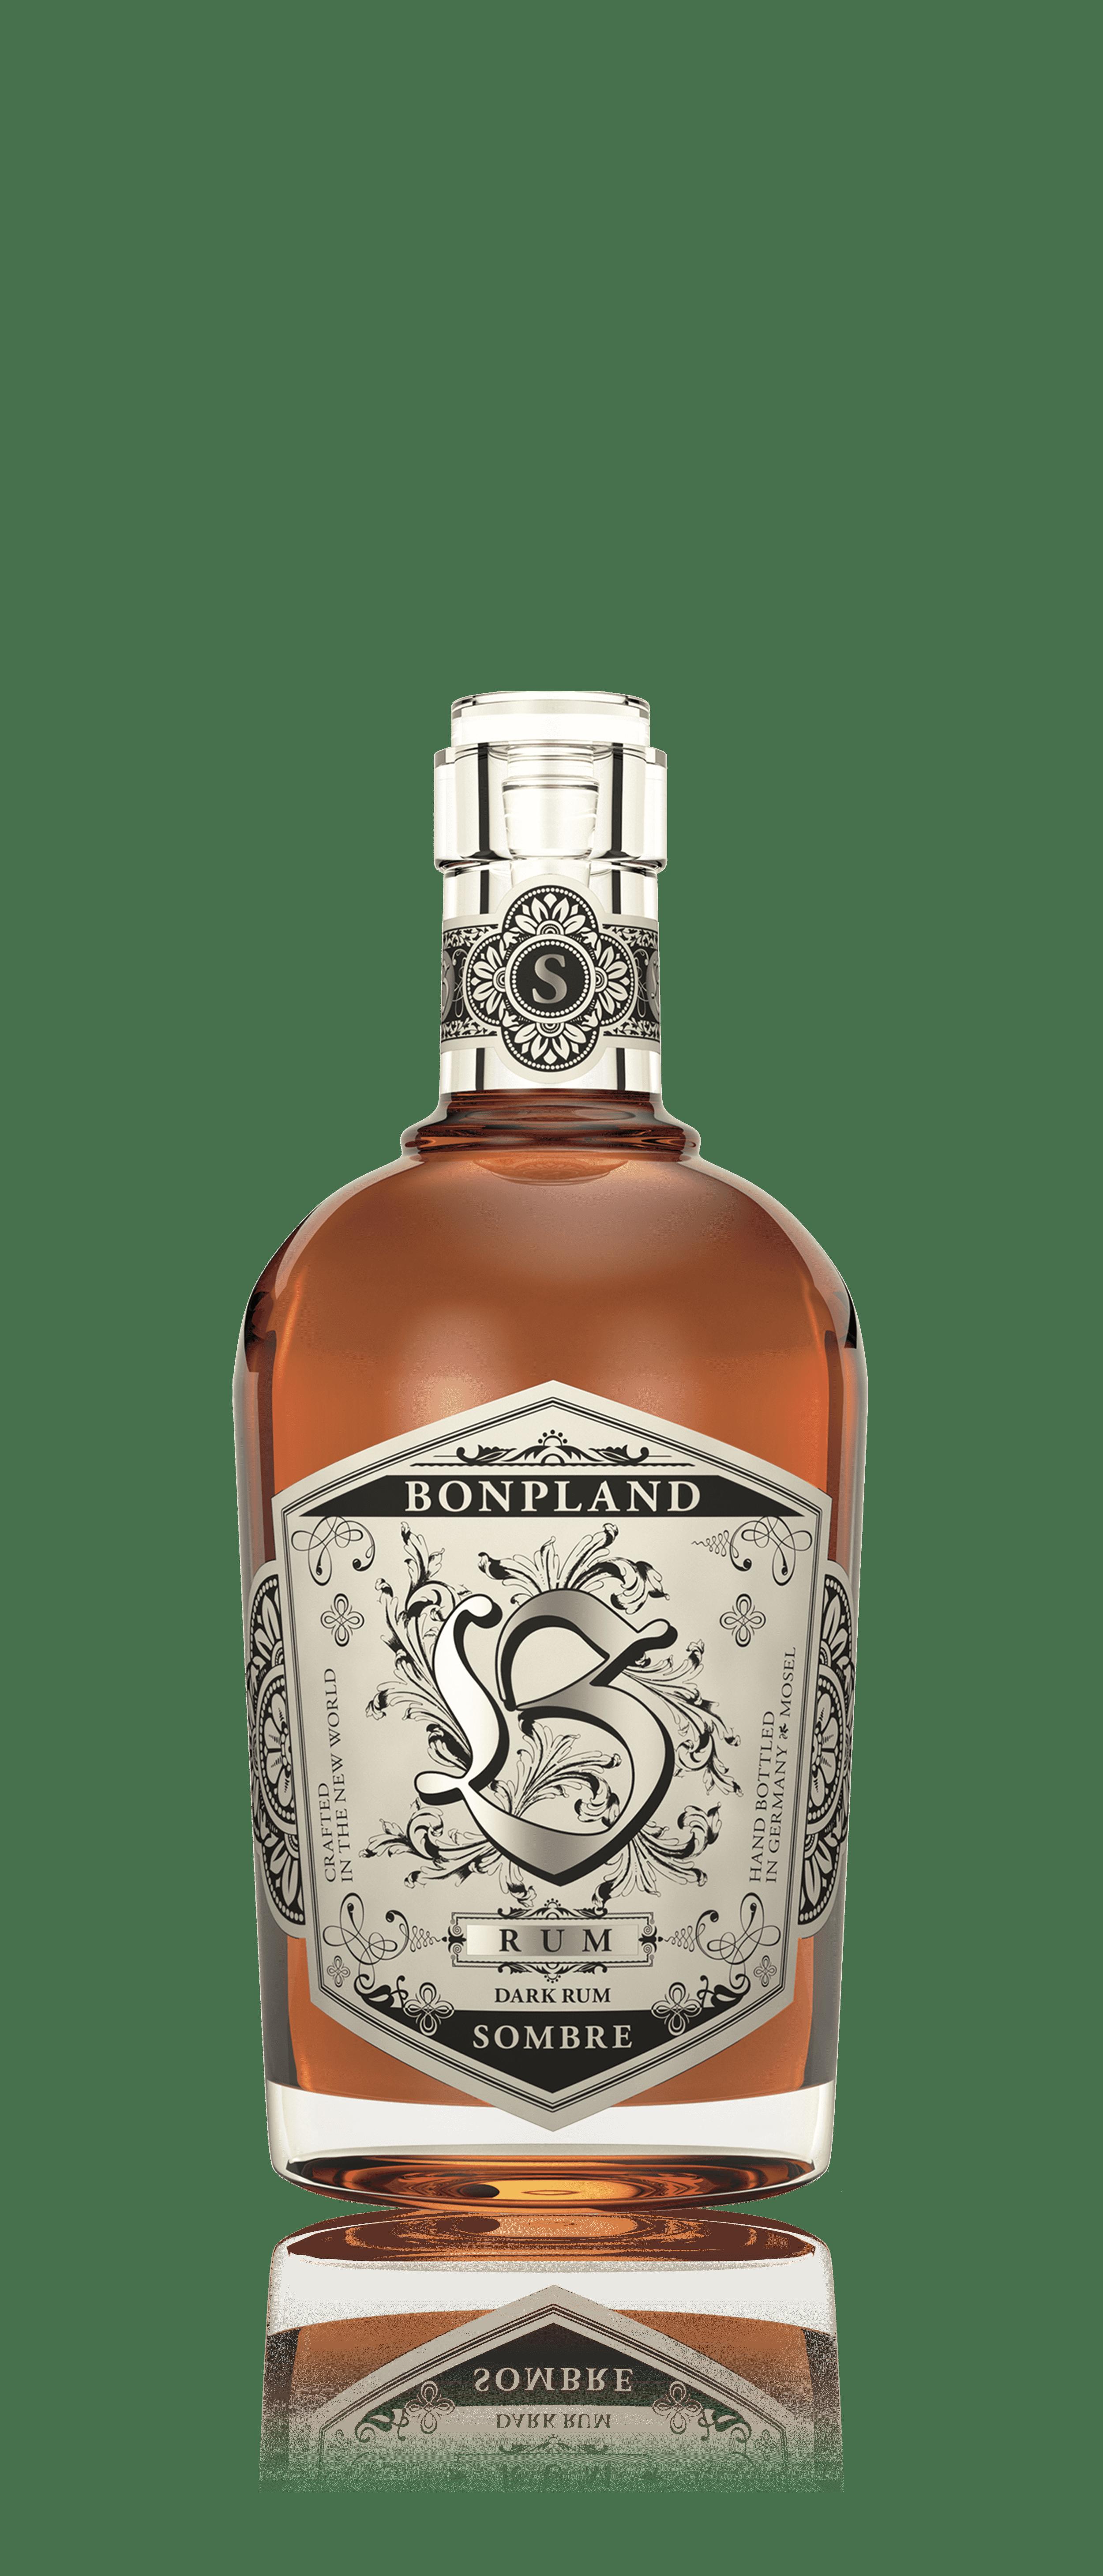 bonpland-rum-sombre-hawkins-distribution-vins-et-spiritueux-300_optim